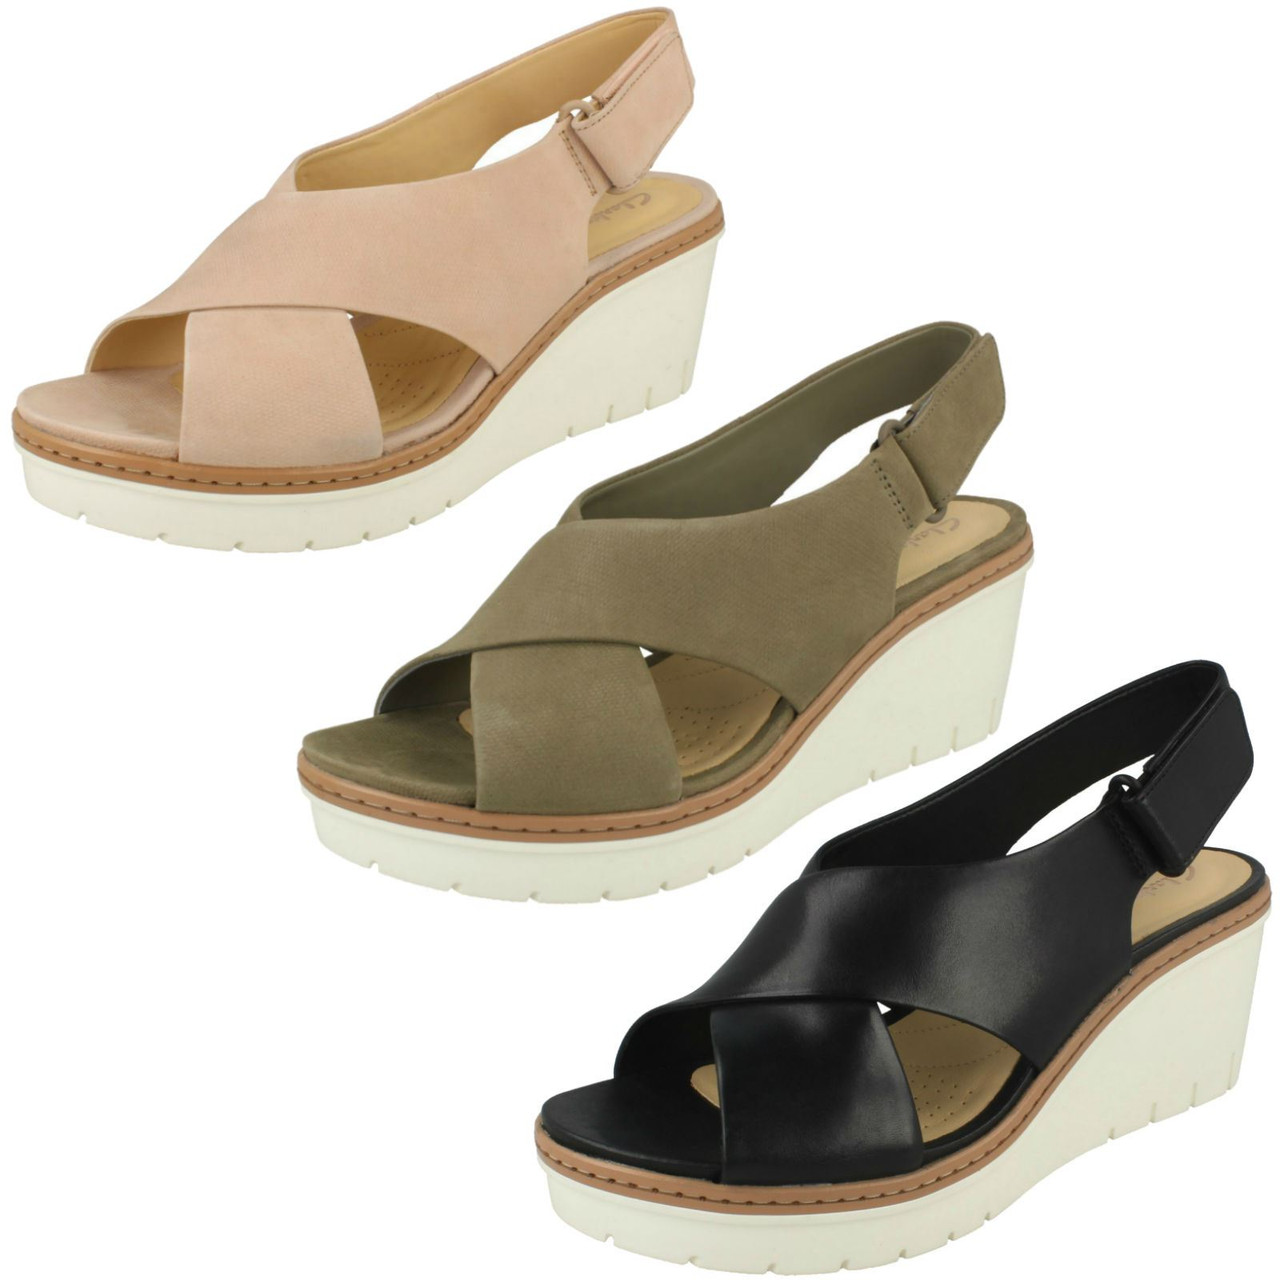 Ladies Clarks Slingback Wedge Heel Sandals Palm Candid